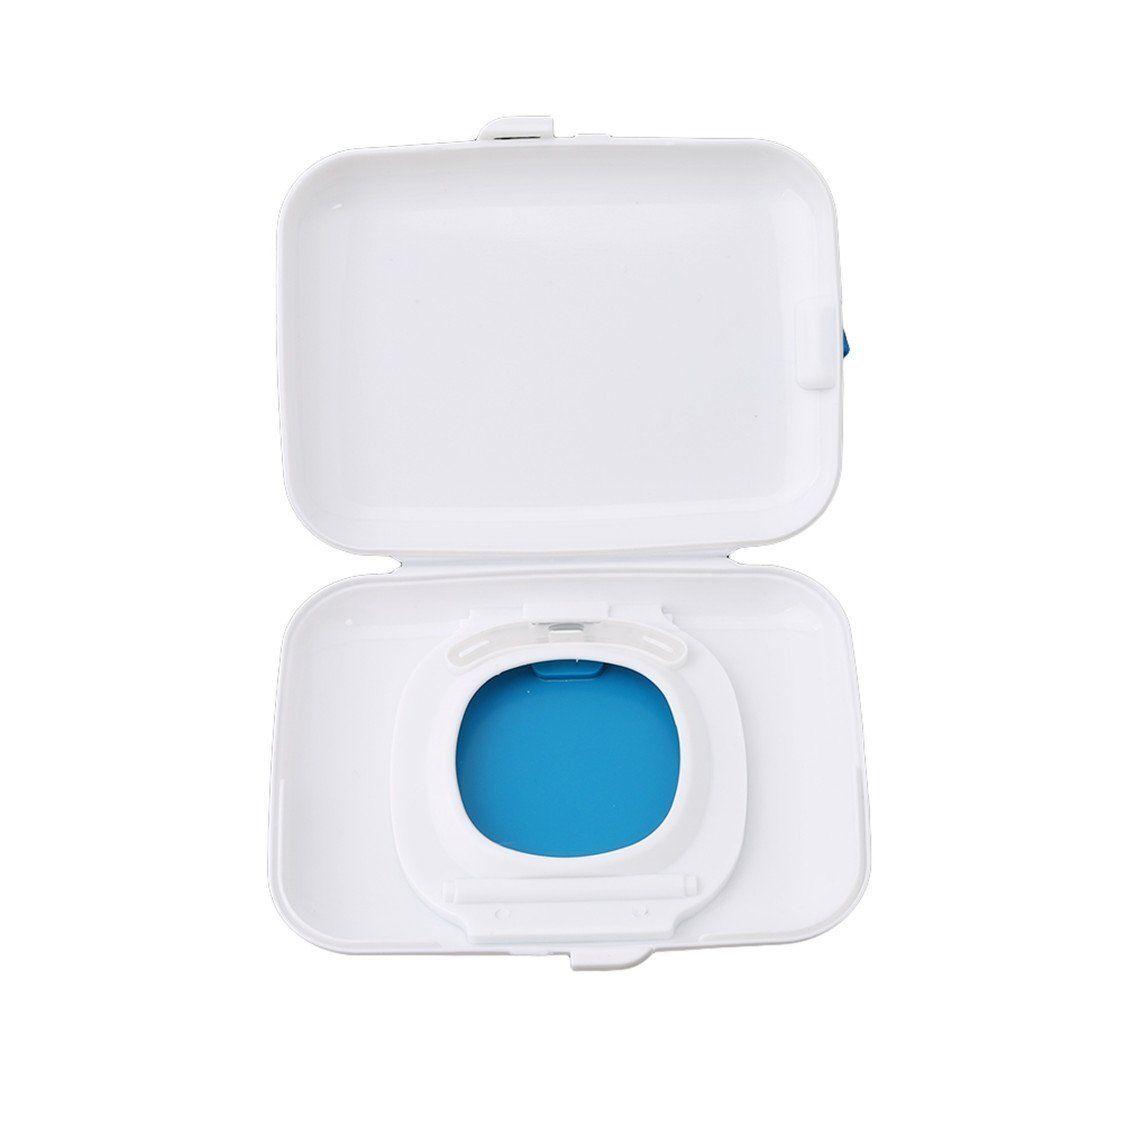 Amazon.com: Yesido. Outdoors Wipes Towel Box Portable Wet Tissue Box ...